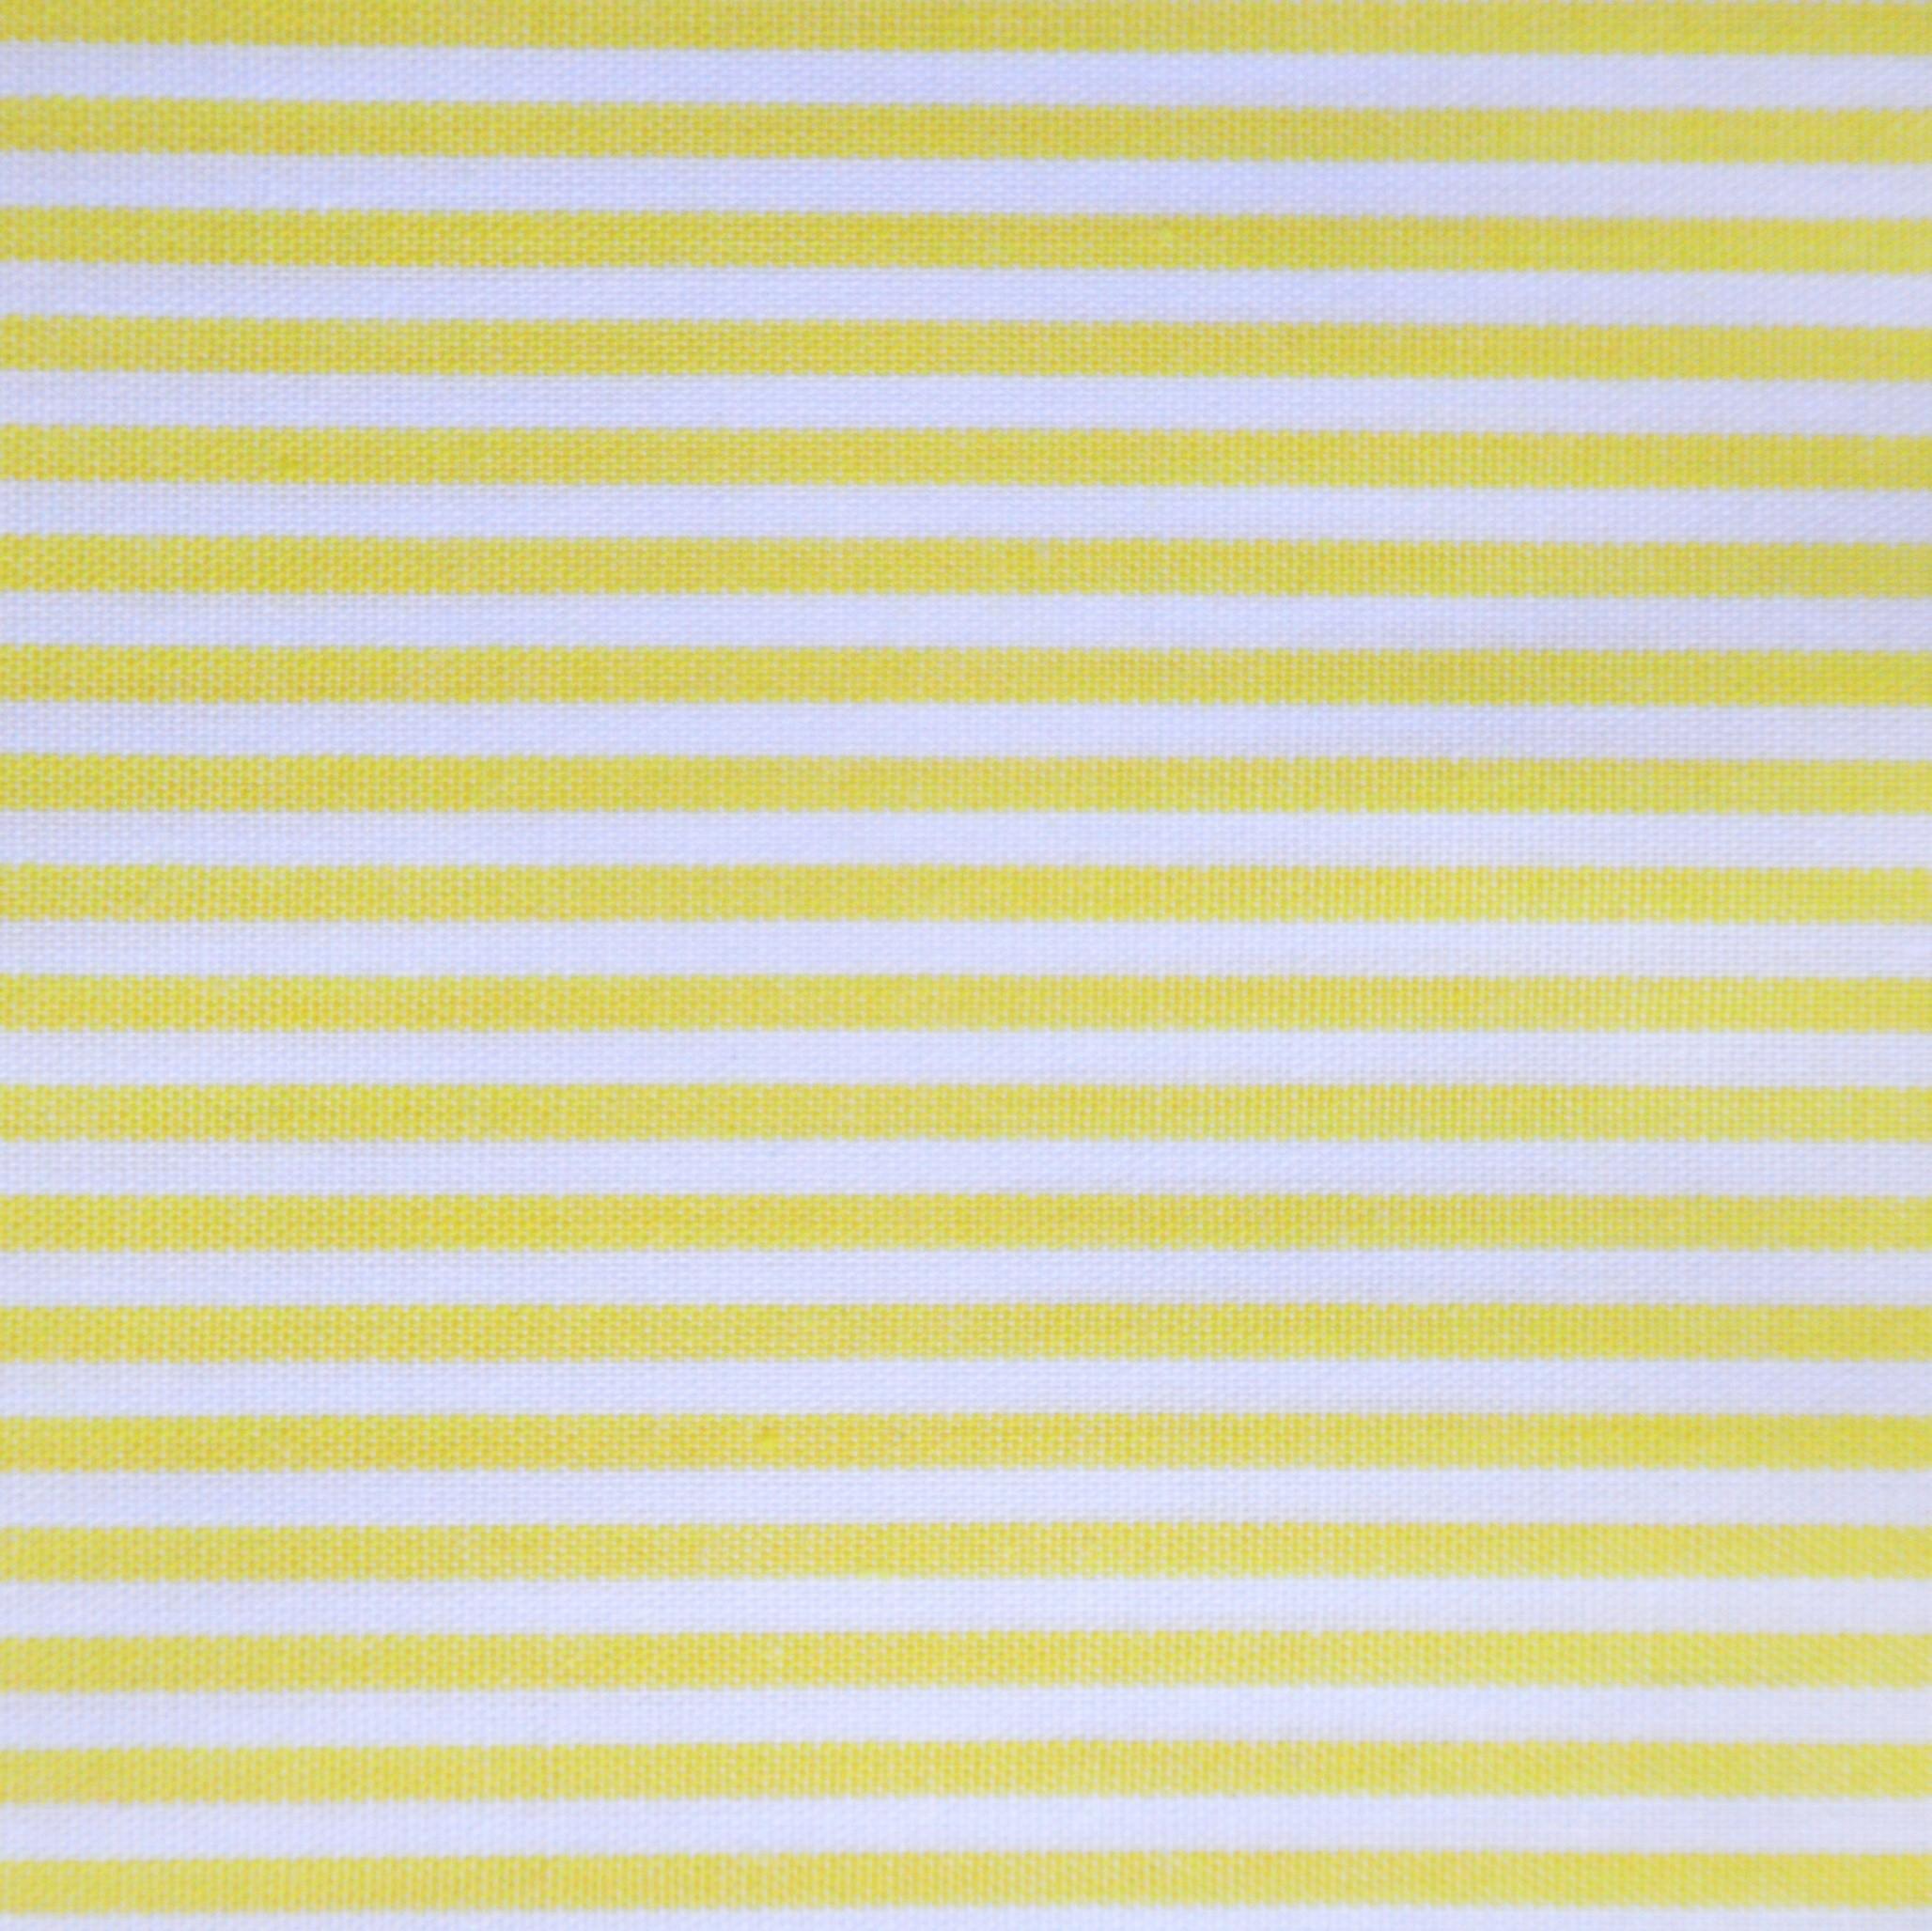 203 rayas amarillas